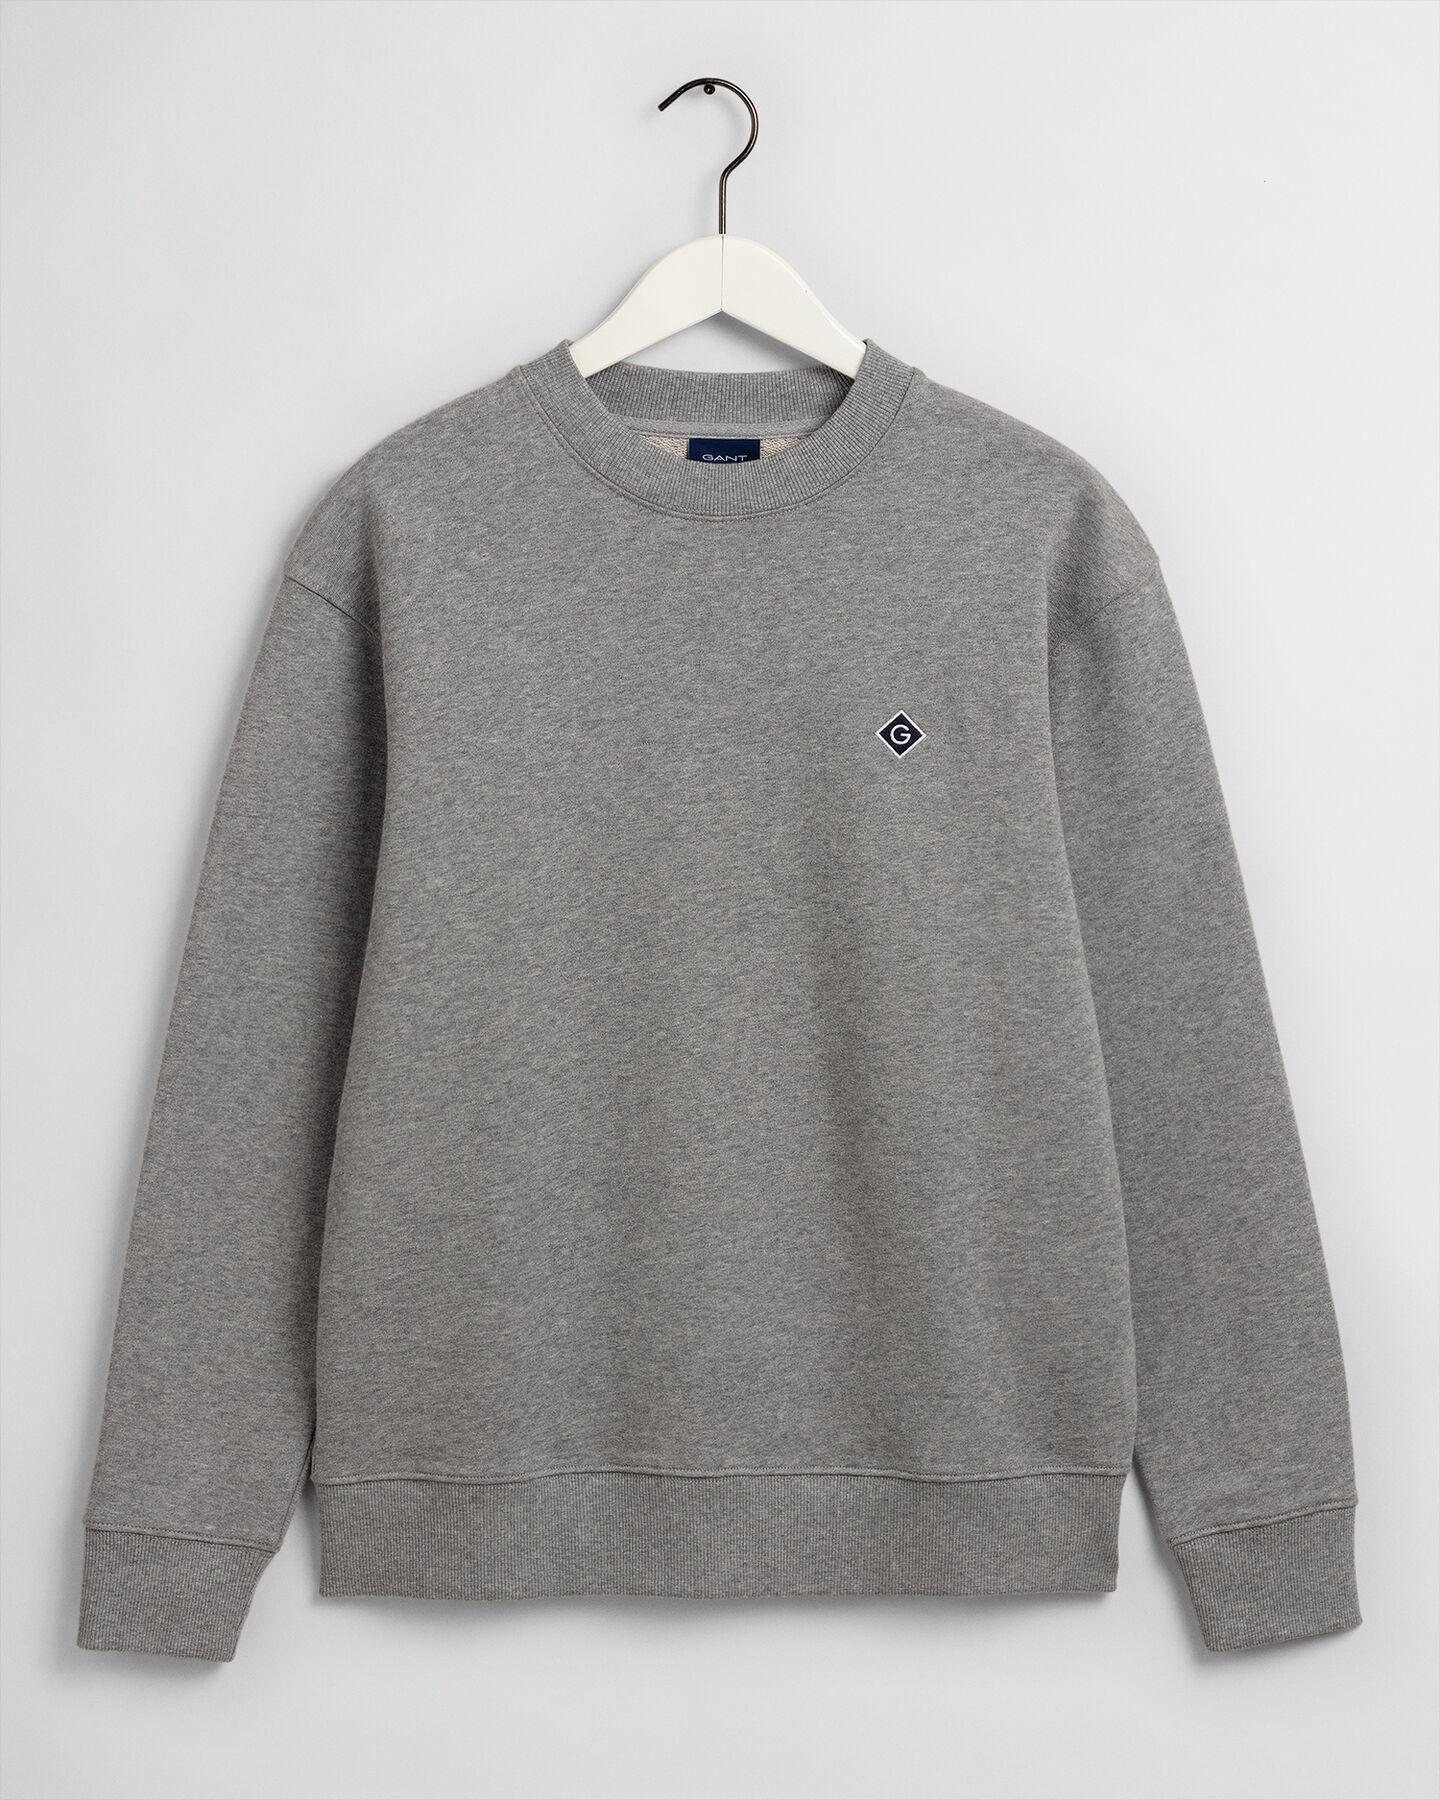 Diamond G Rundhals-Sweatshirt